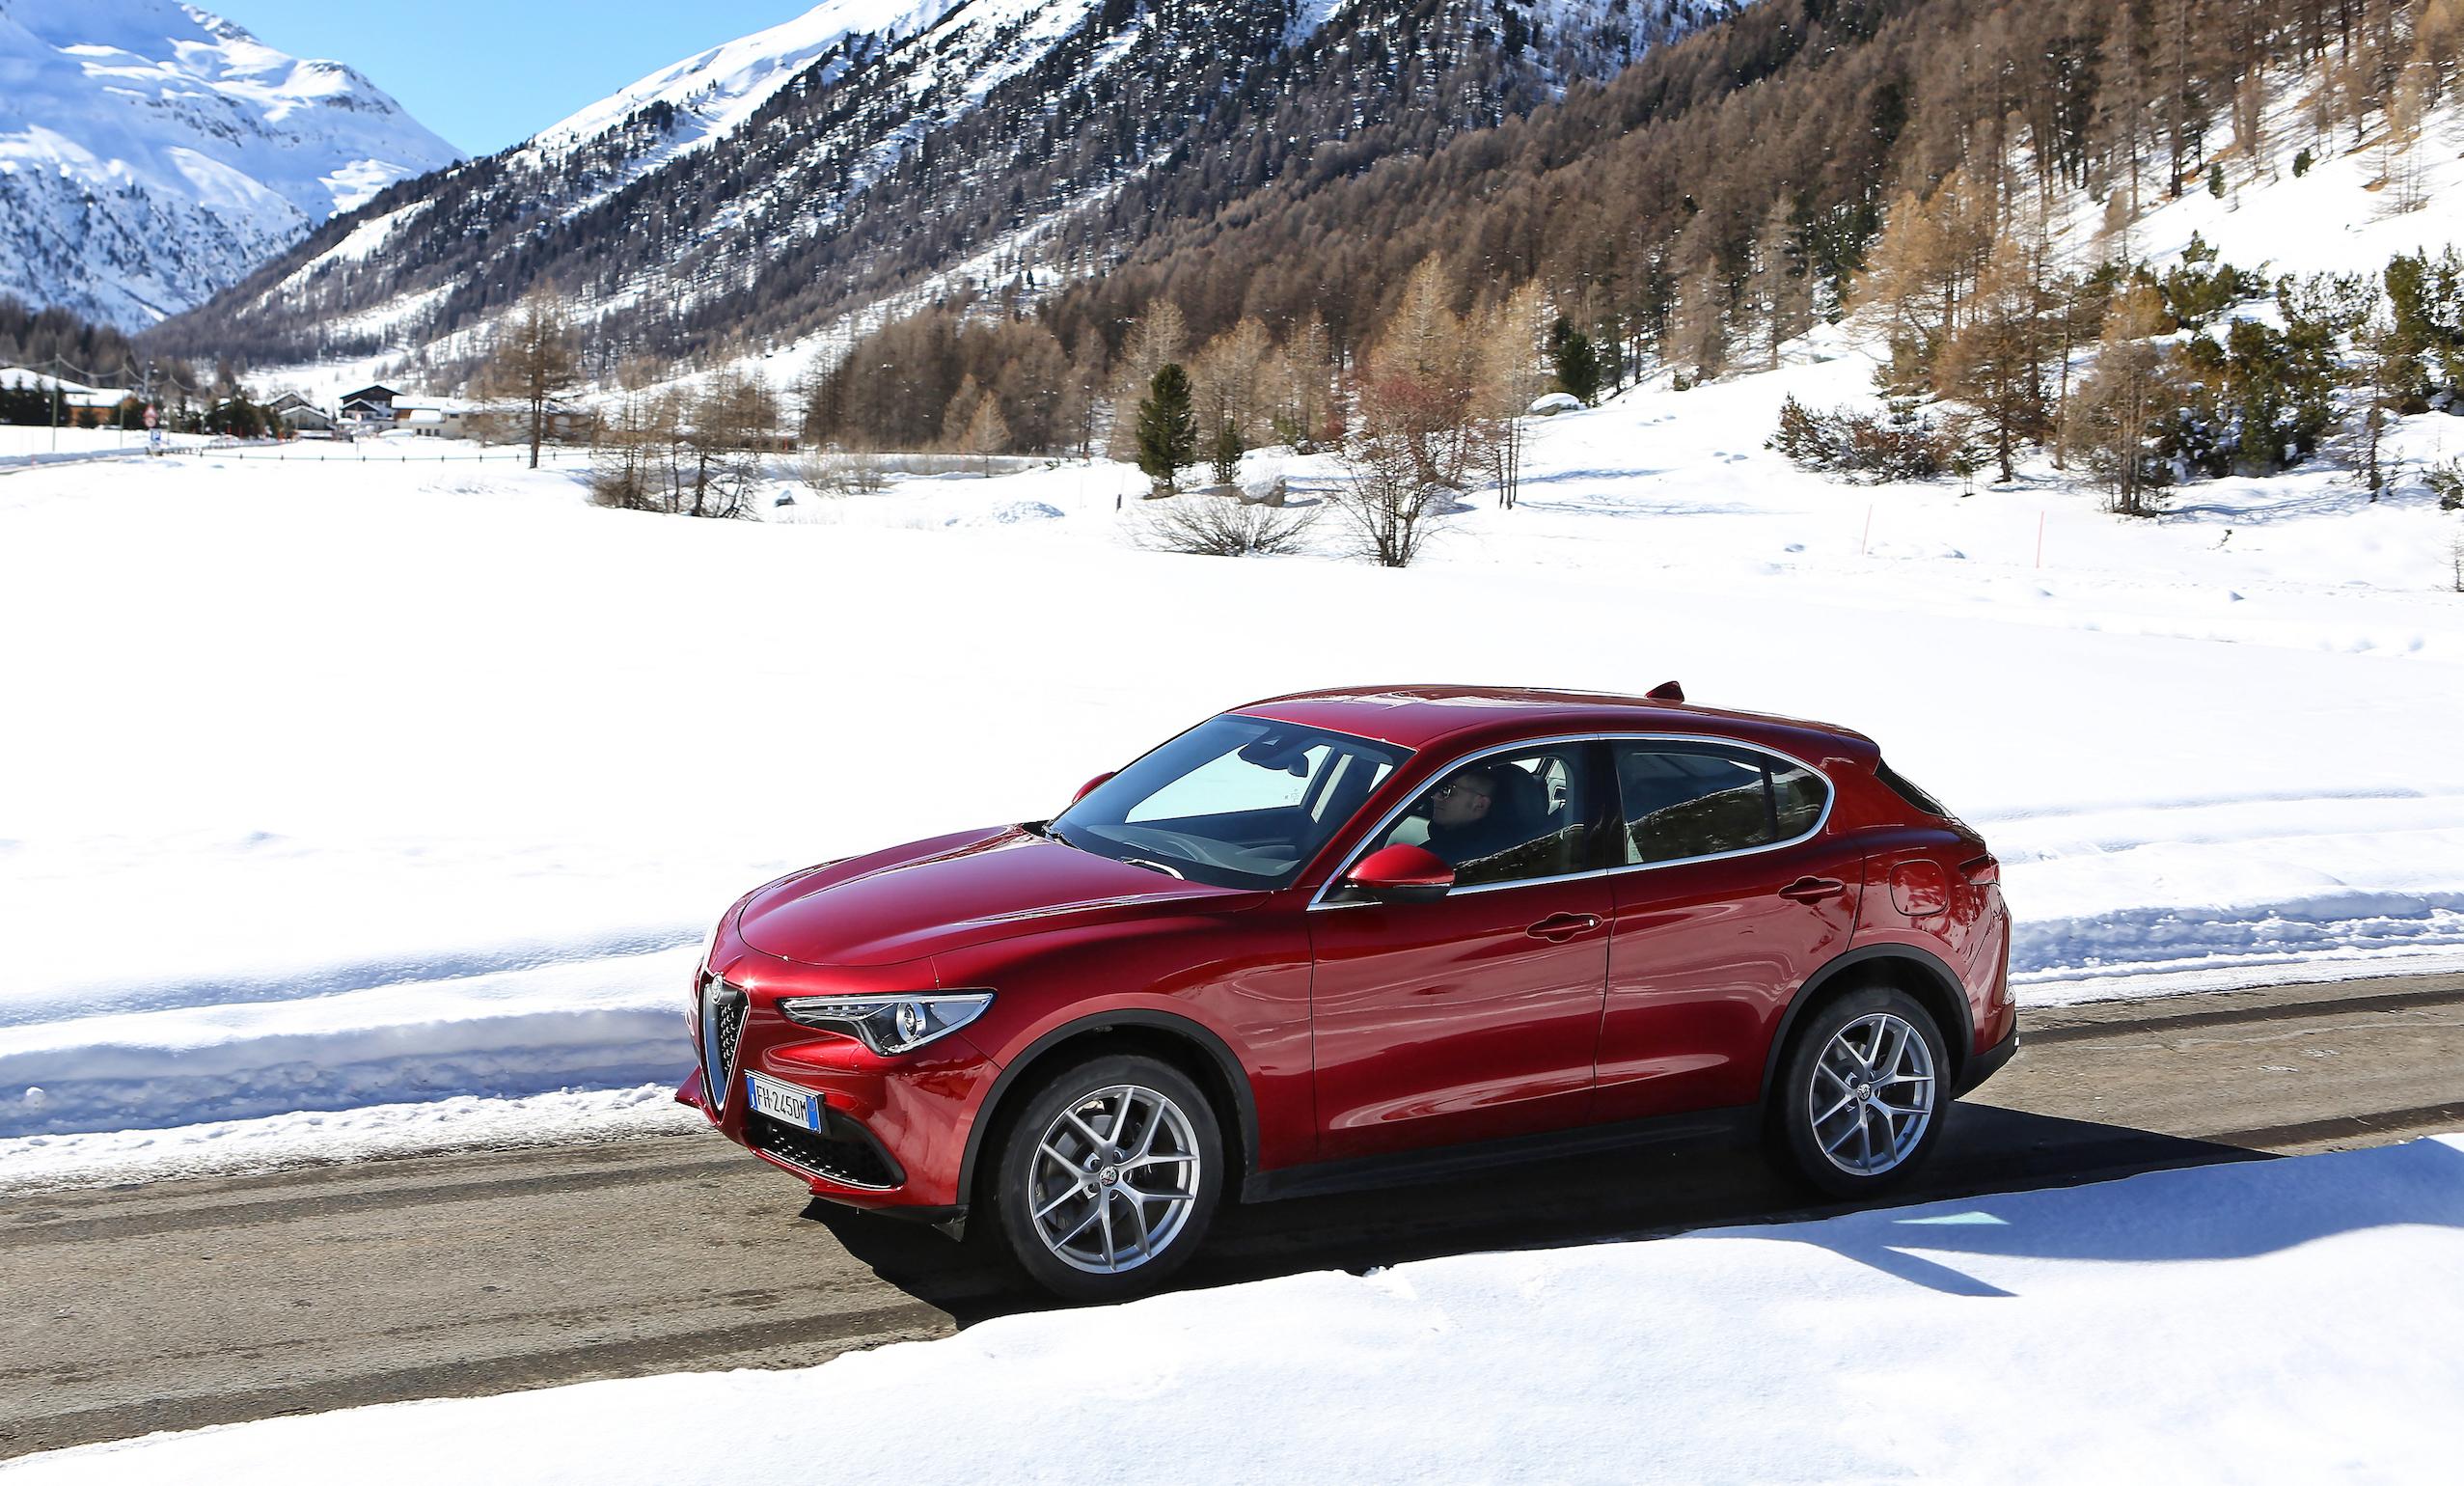 The Alfa Romeo Stelvio Super brings Italian flair to the SUV world